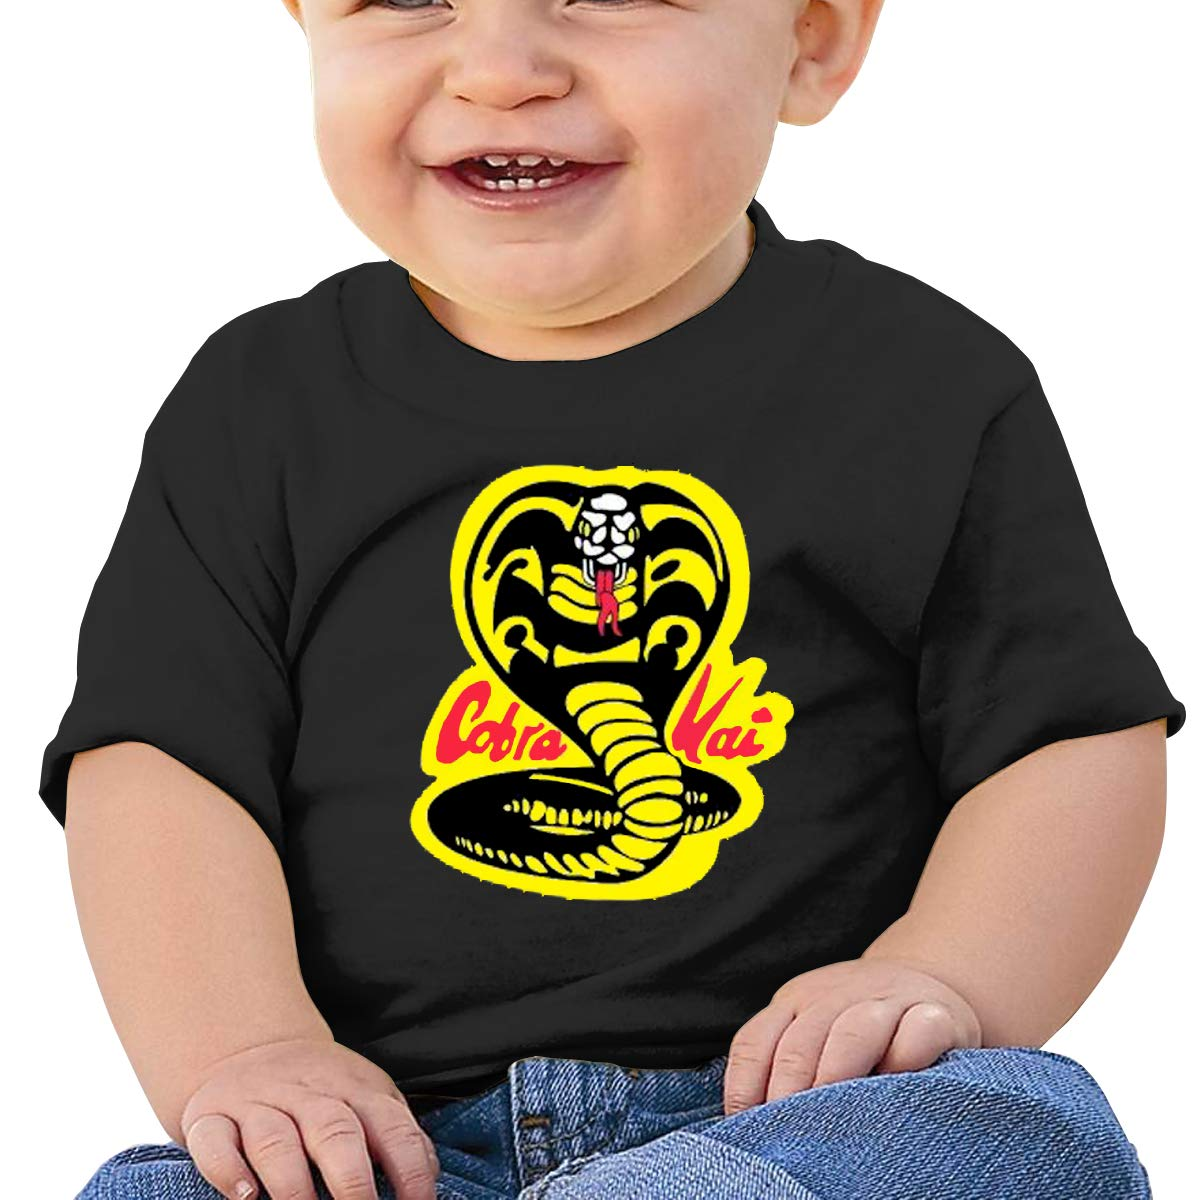 MONIKAL Unisex Infant Short Sleeve T-Shirt Cobra-Kai-Denim-Dad Toddler Kids Organic Cotton Graphic Tee Tops